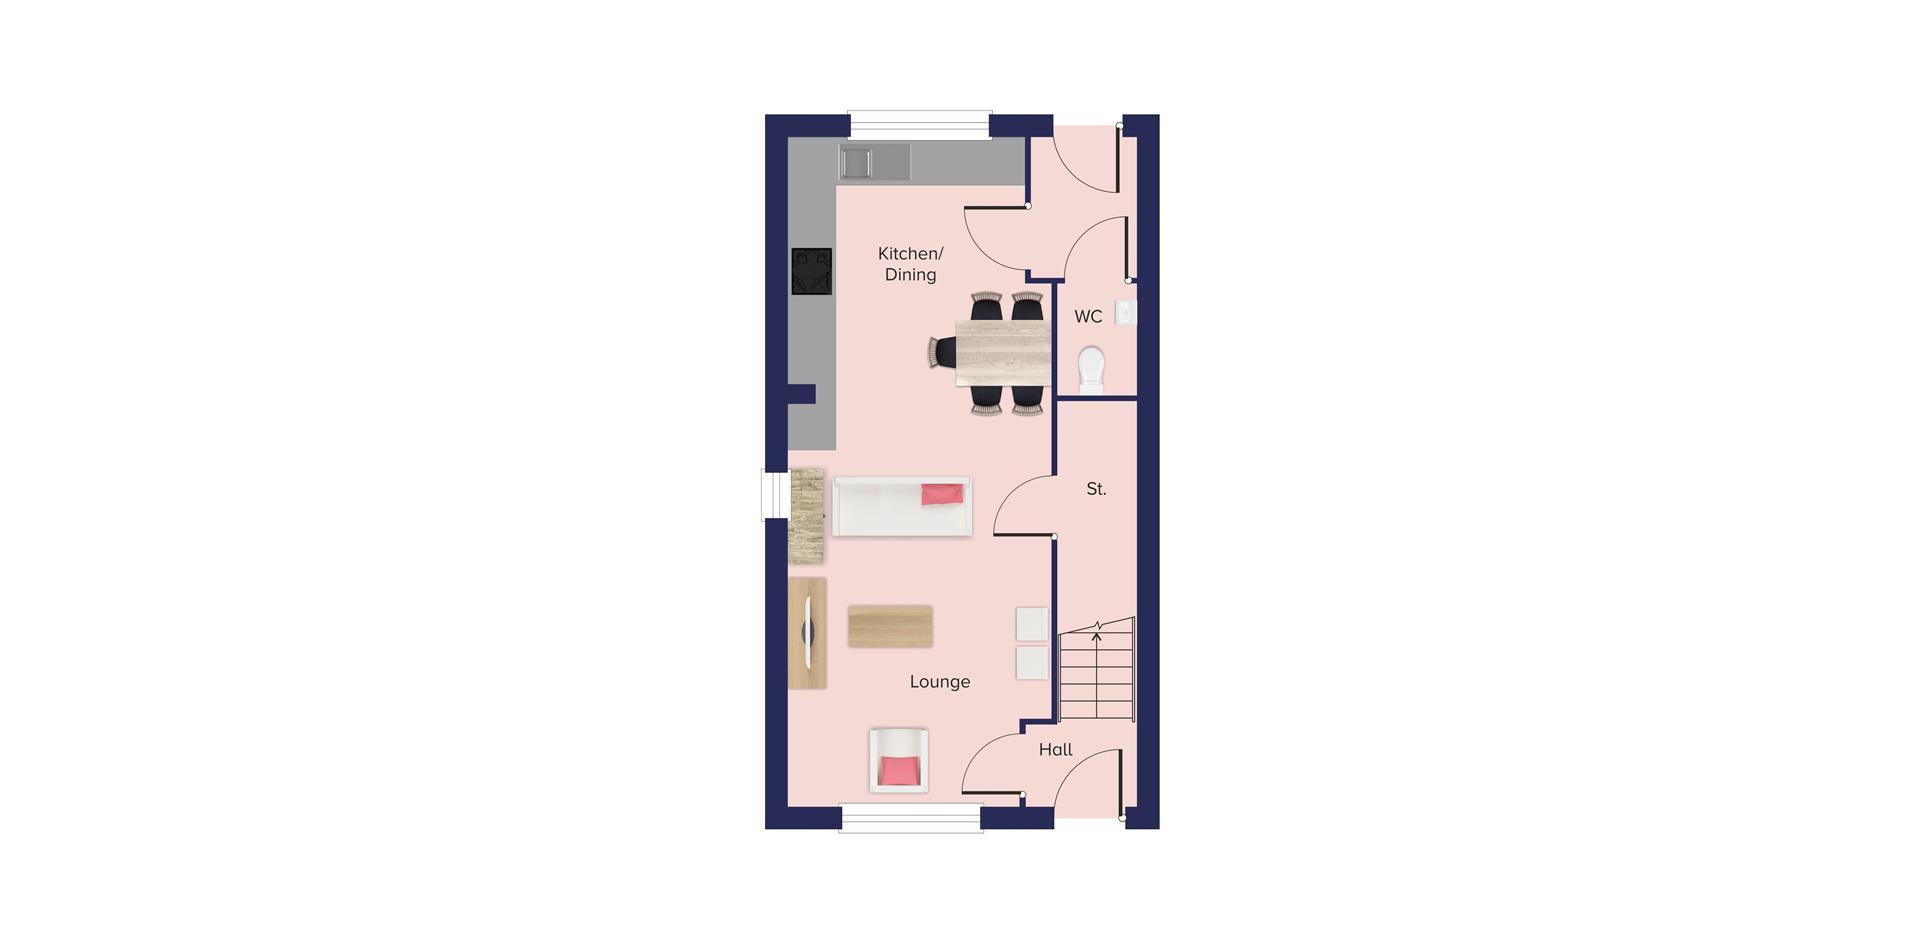 Northwalls Grange_Plots 42 45 46 49 62 63 64 65 68